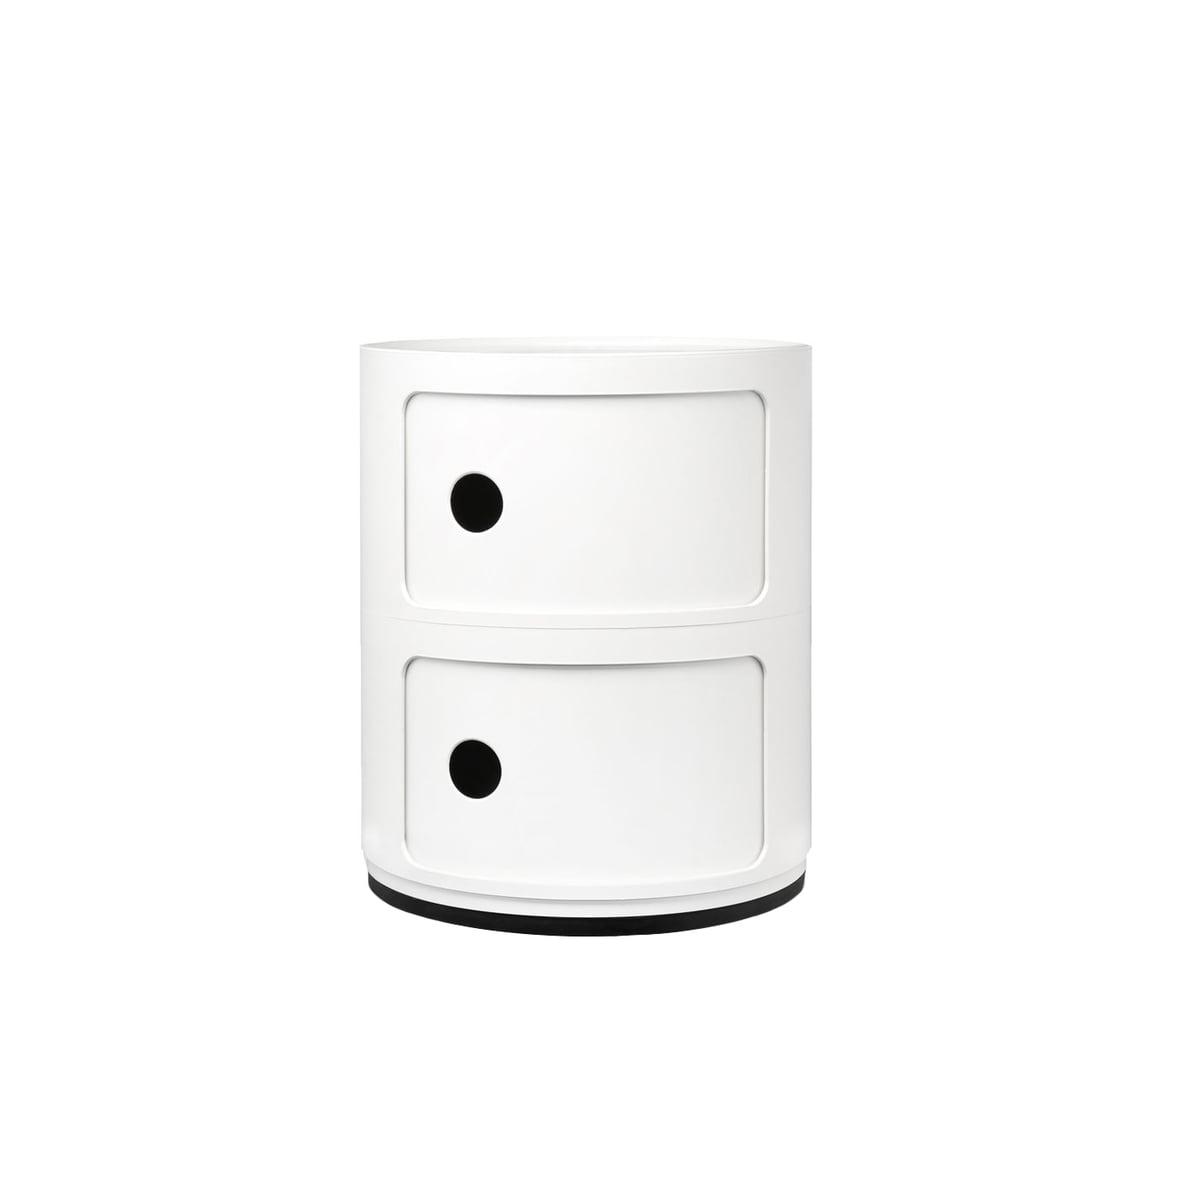 Table De Chevet Componibili kartell - componibili 4966, blanc